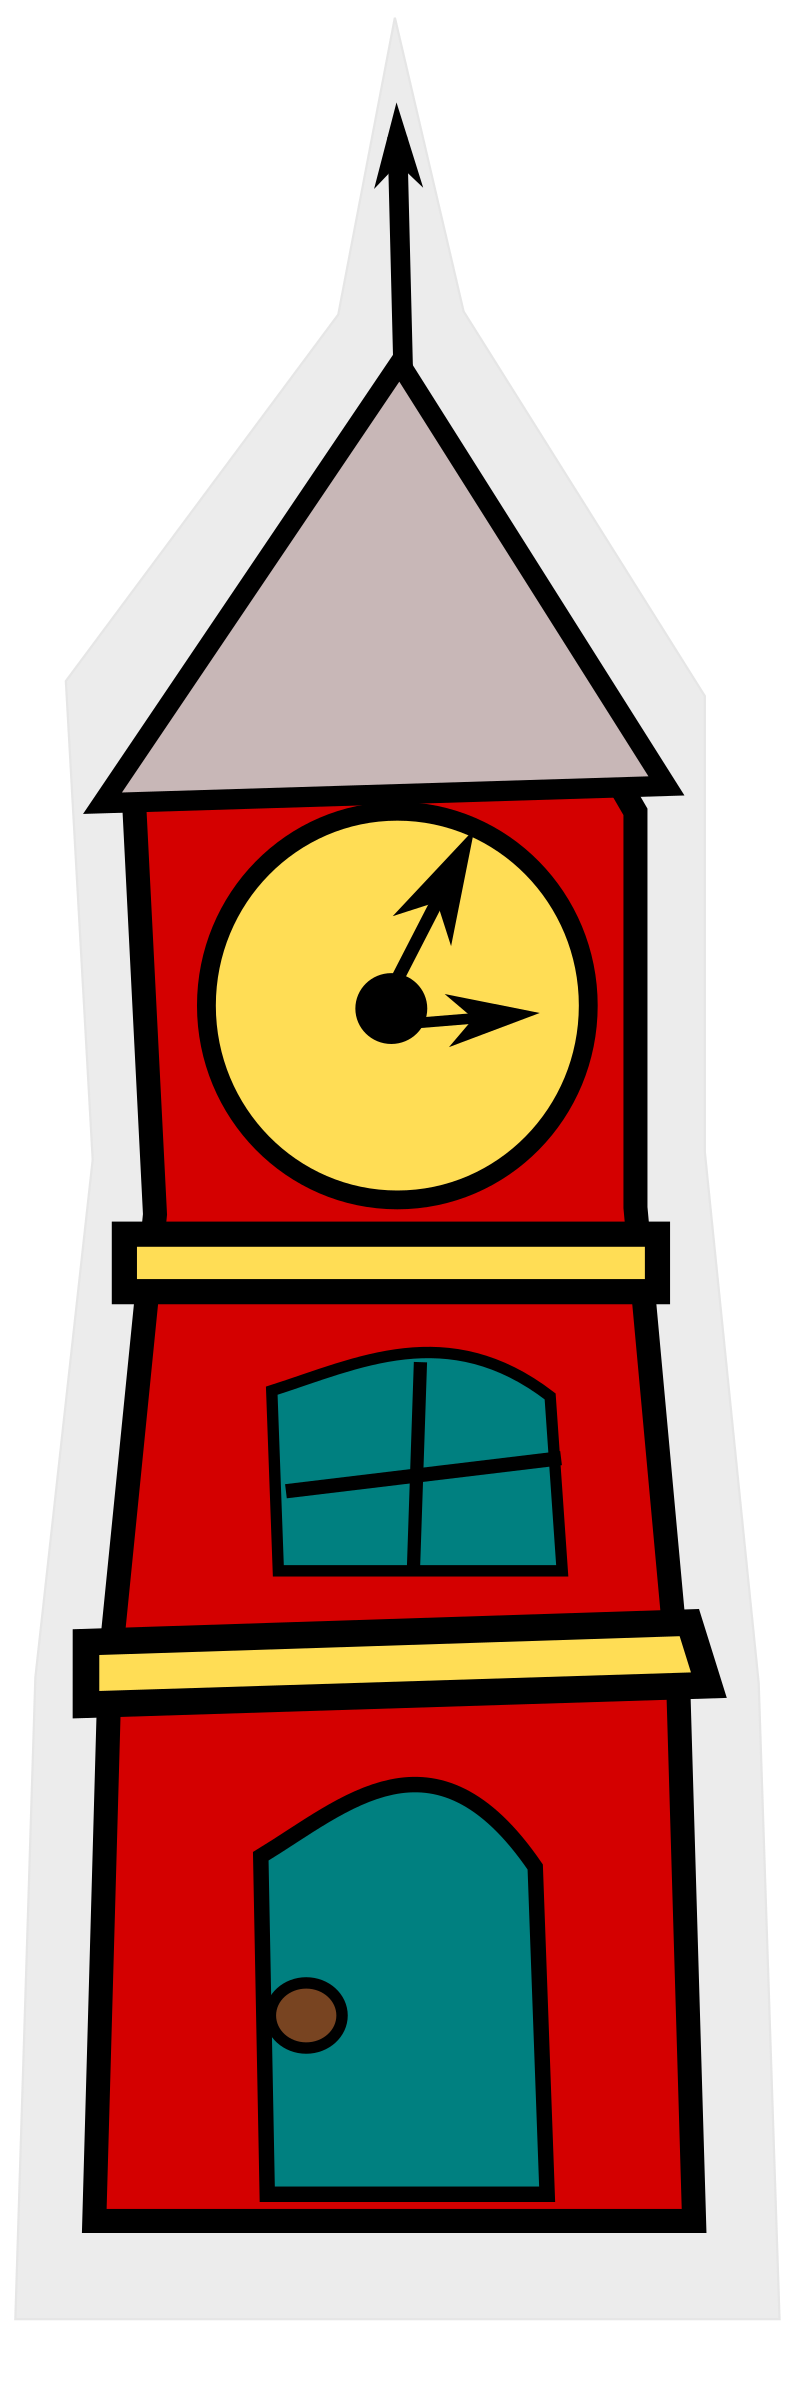 clip art clock tower - photo #10